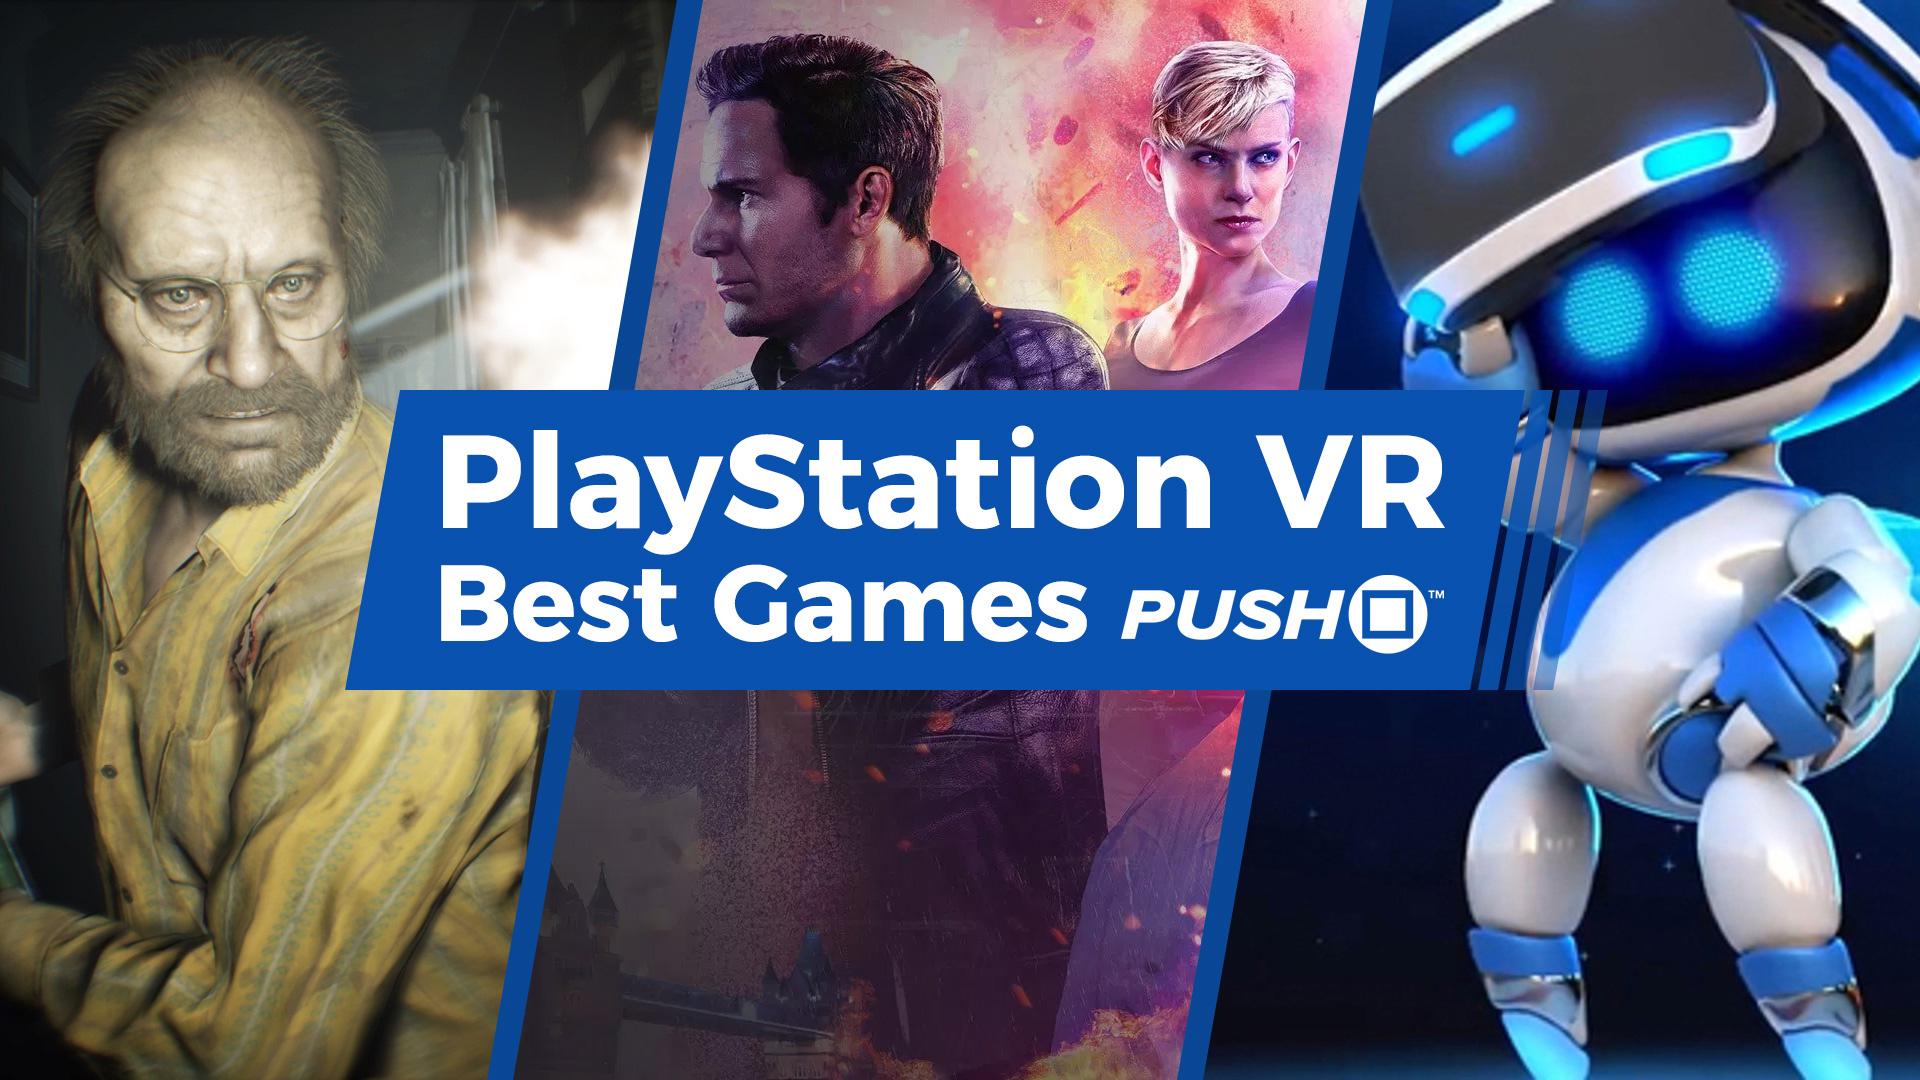 Guide: Best PSVR Games